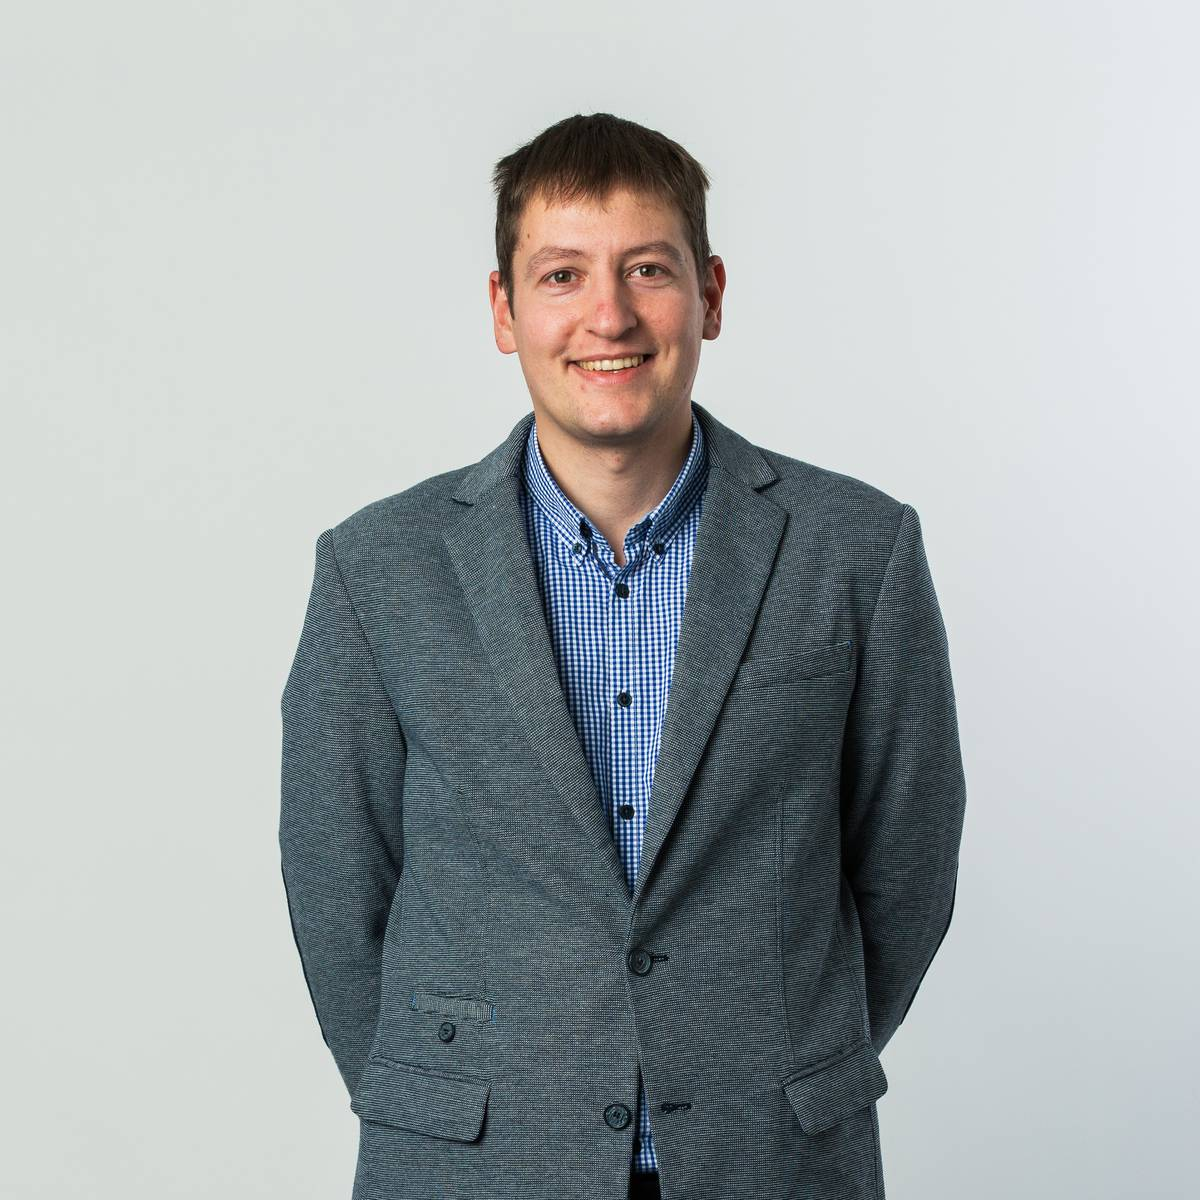 A profile image of Eugene Dementiev